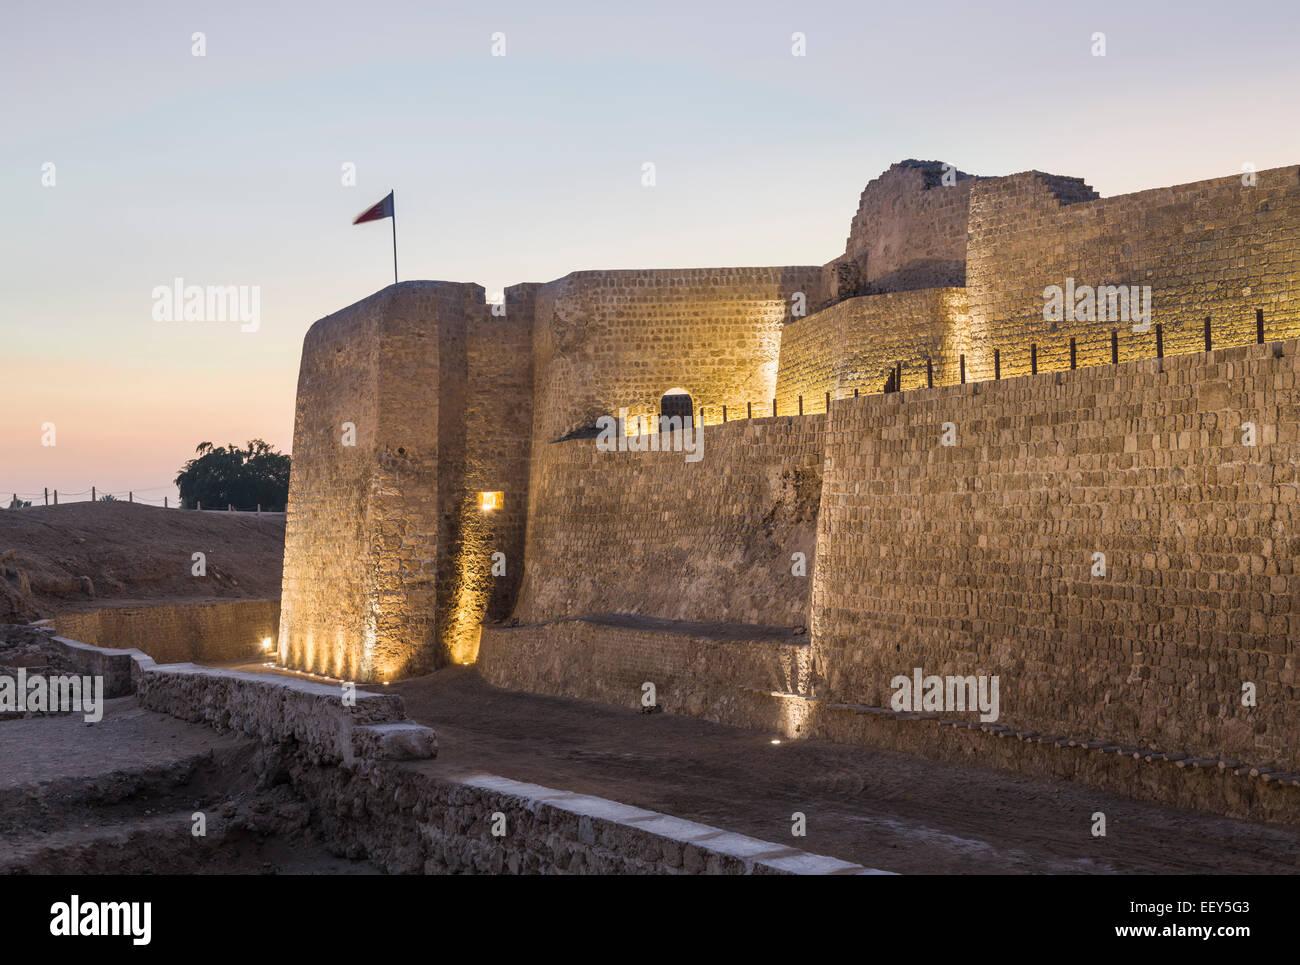 Tramonto al Bahrain Fort vicino a Manama al Seef, Bahrain Immagini Stock